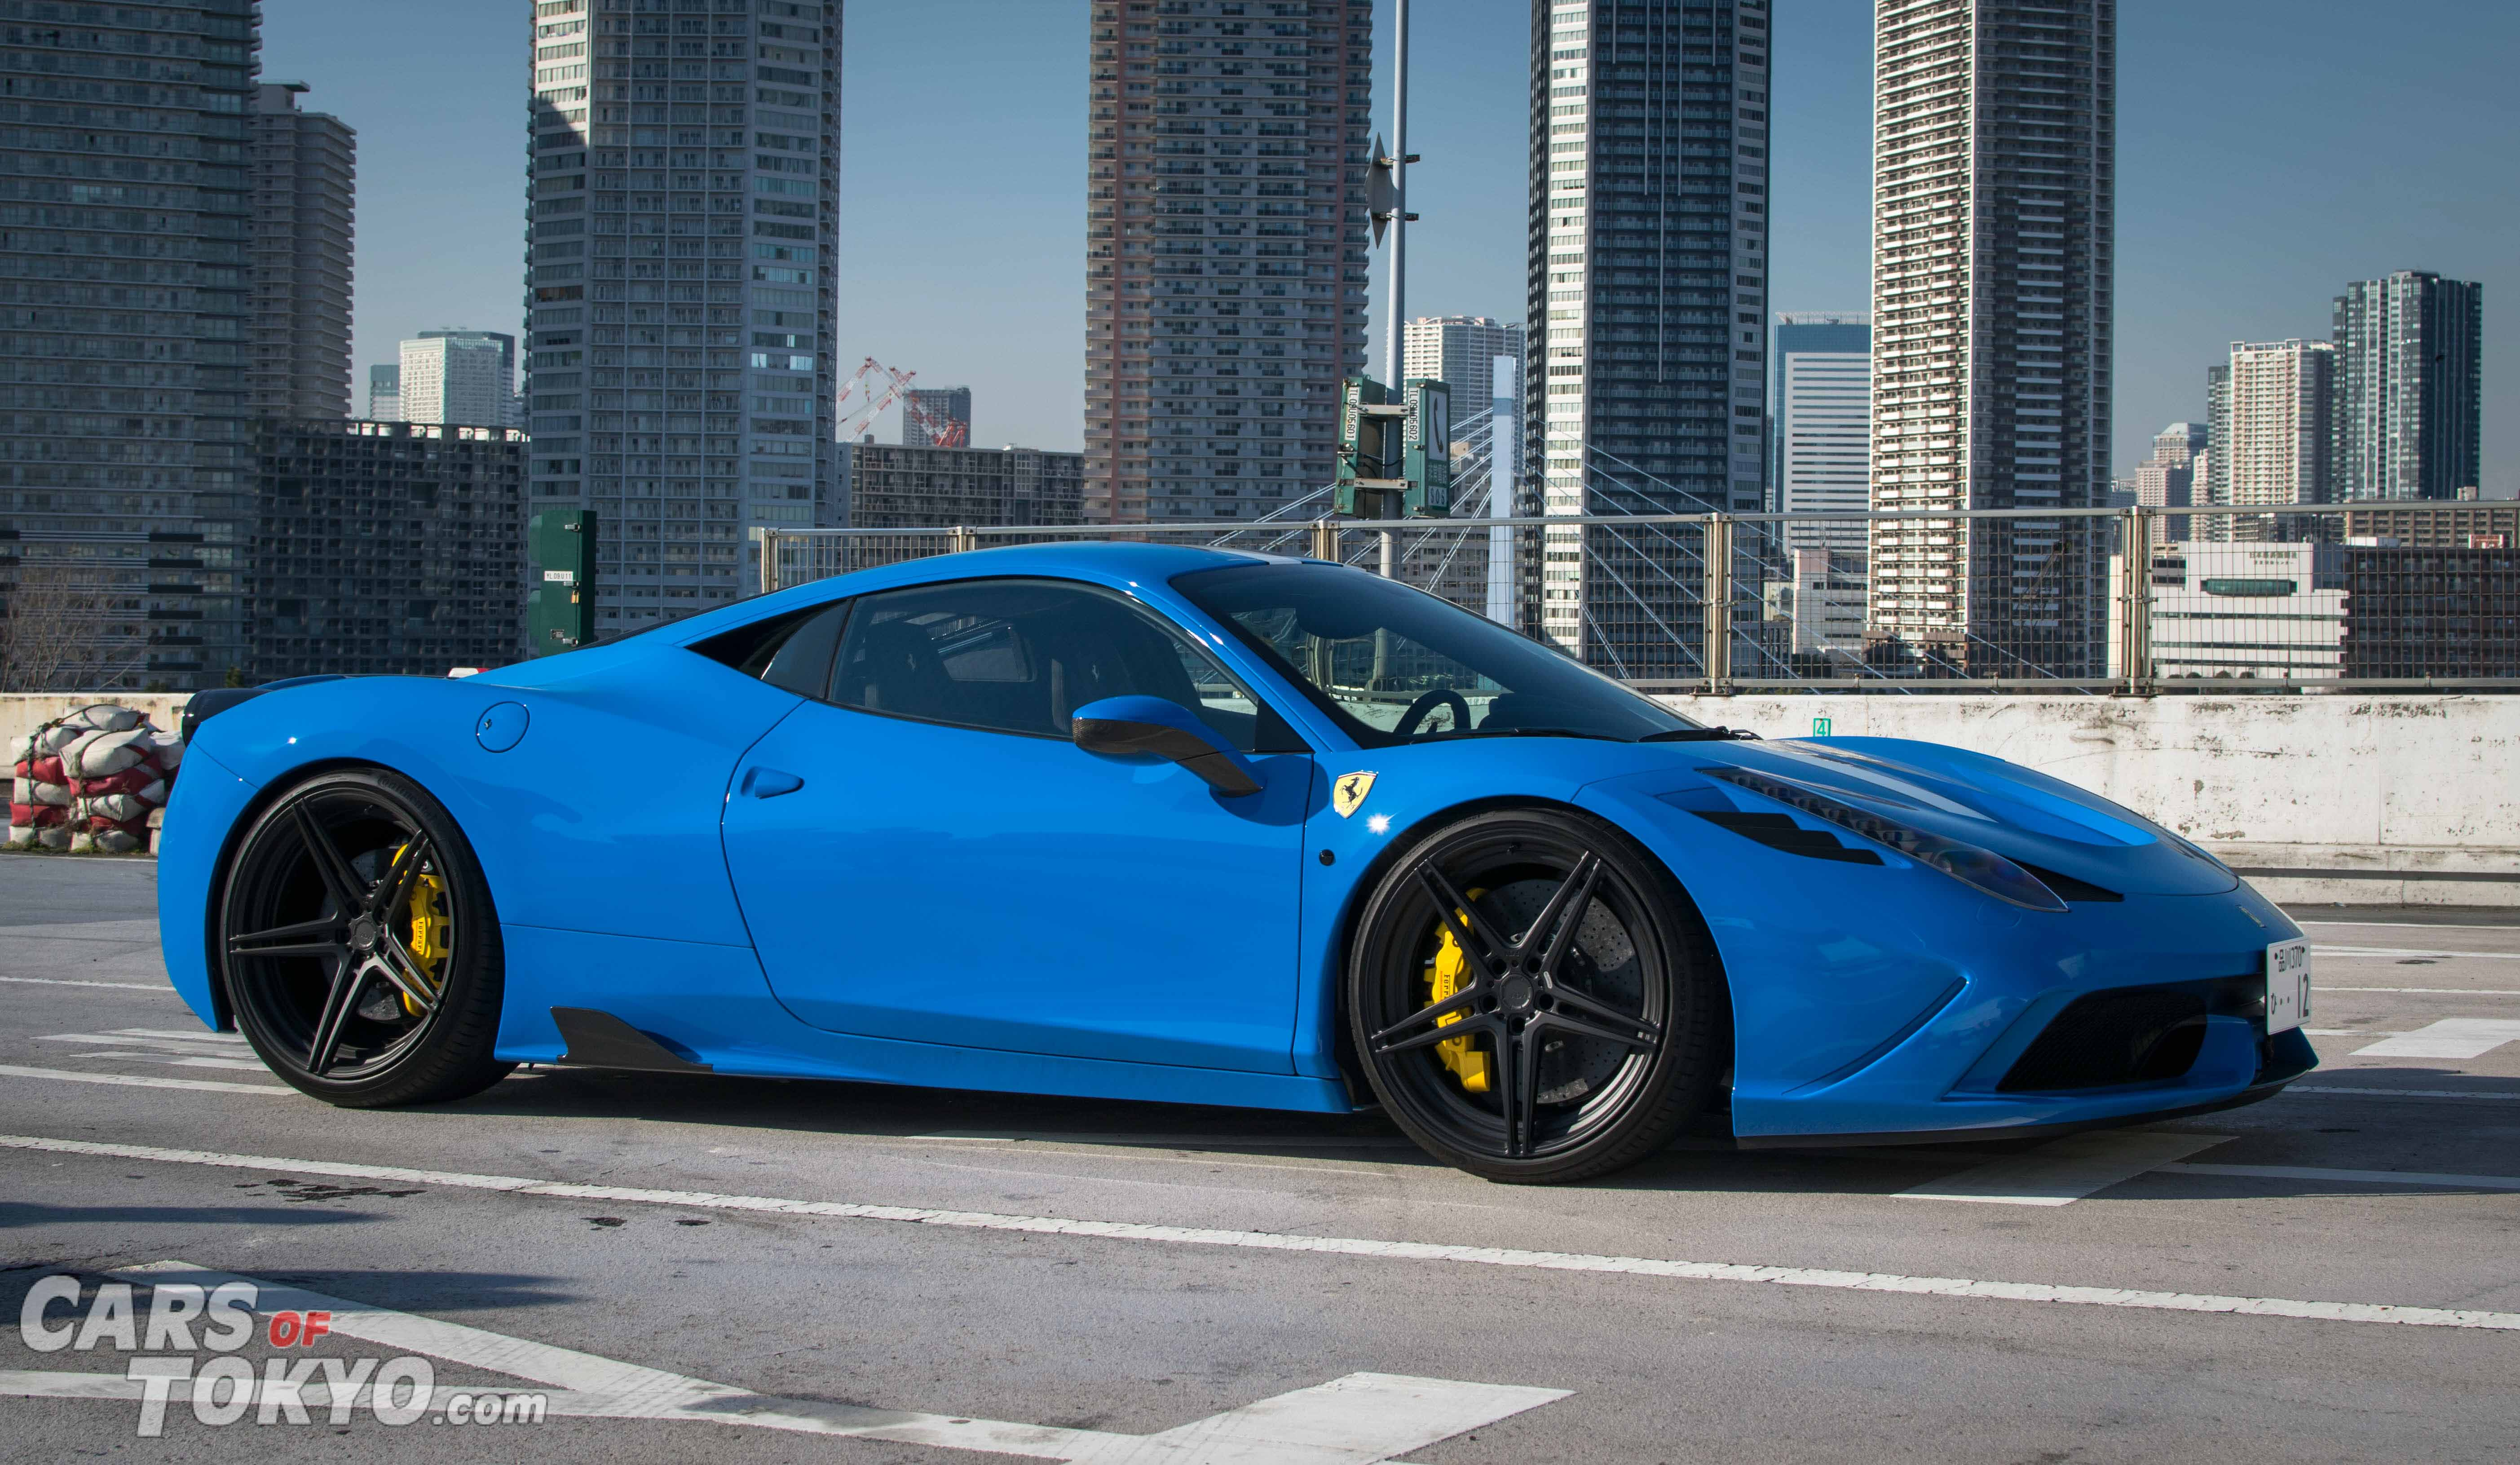 Cars of Tokyo Tatsumi Ferrari 458 Speciale